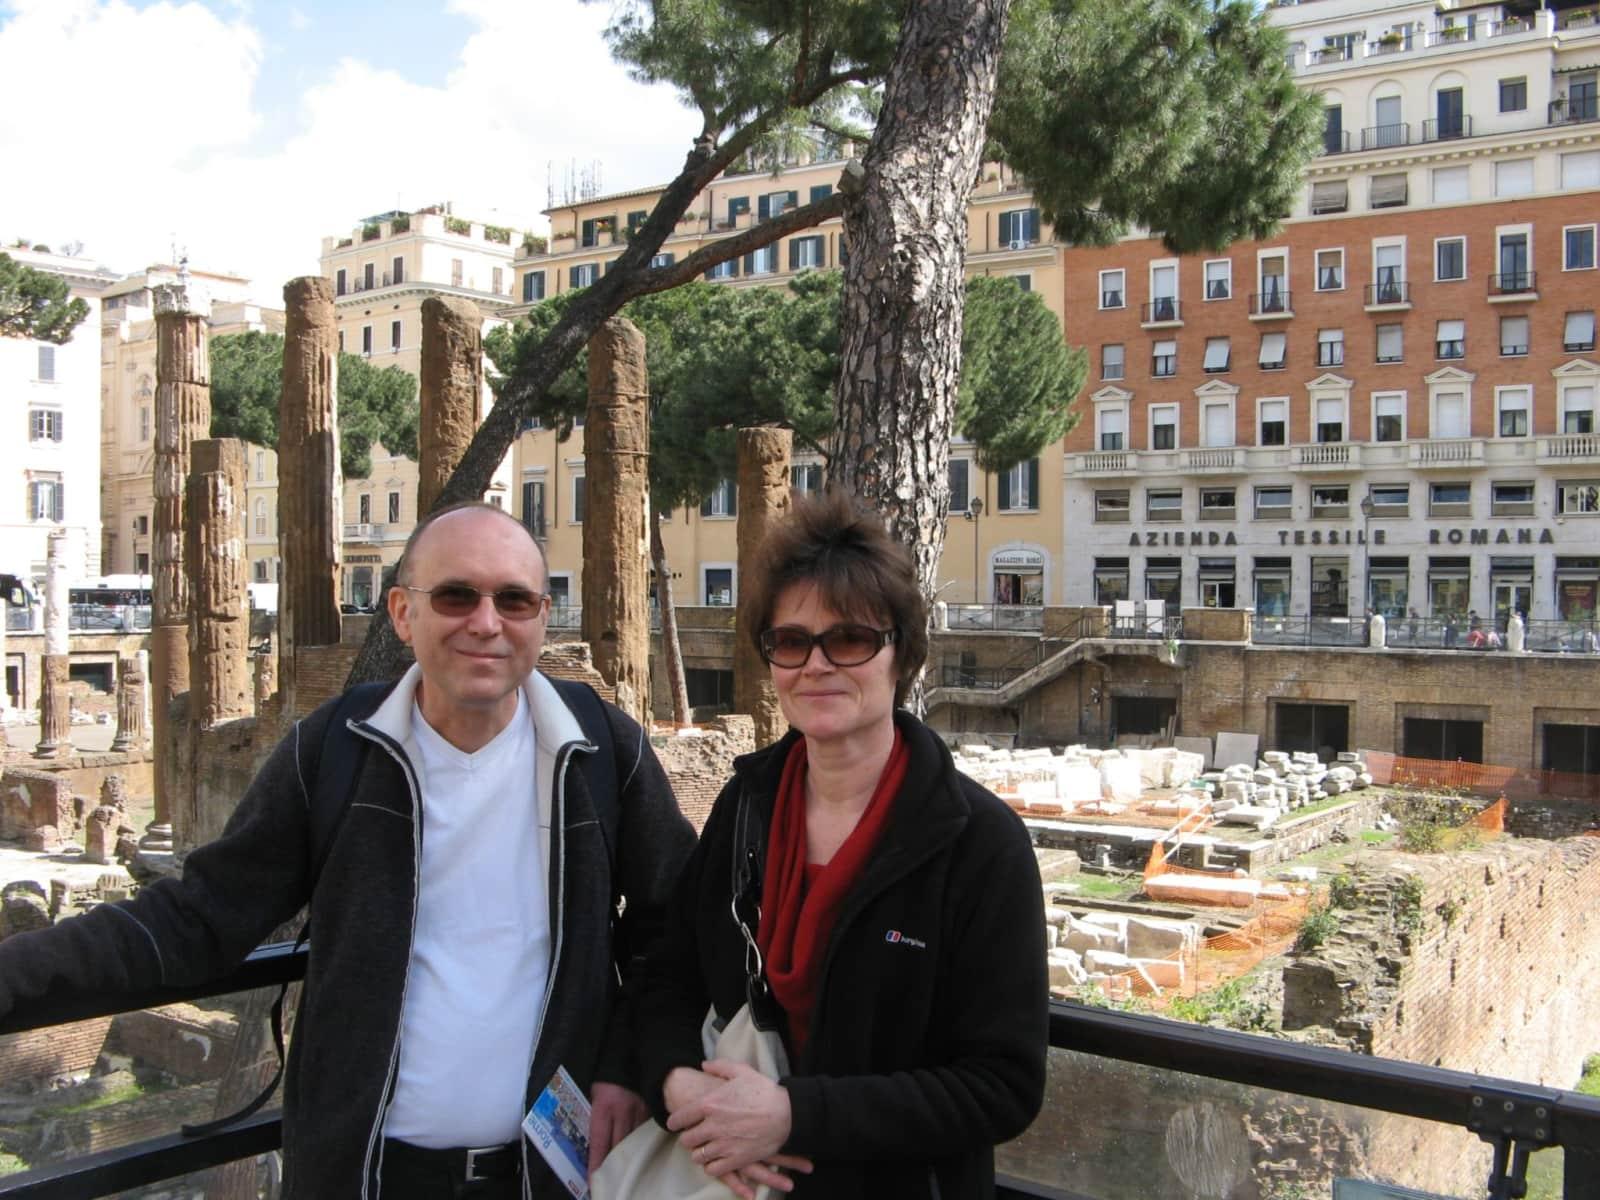 Mick & Deborah from Tansley, United Kingdom